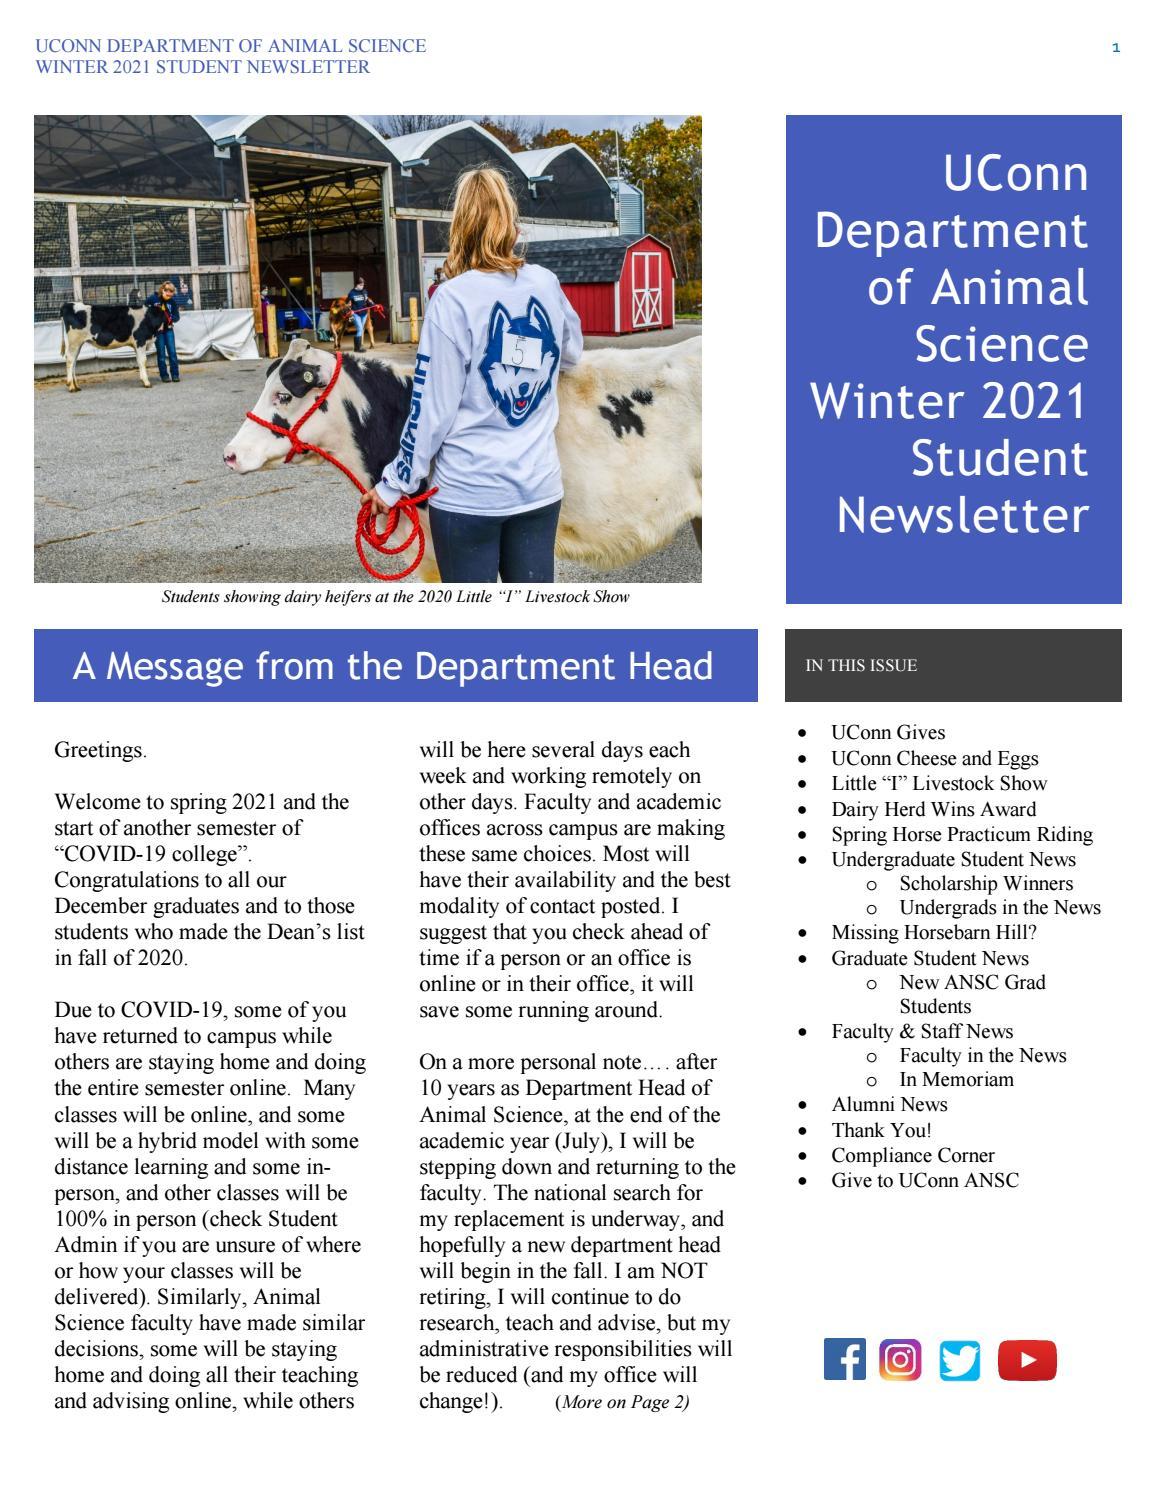 Uconn Spring 2022 Calendar.Winter 2021 Uconn Animal Science Newsletter By Uconn Department Of Animal Science Issuu